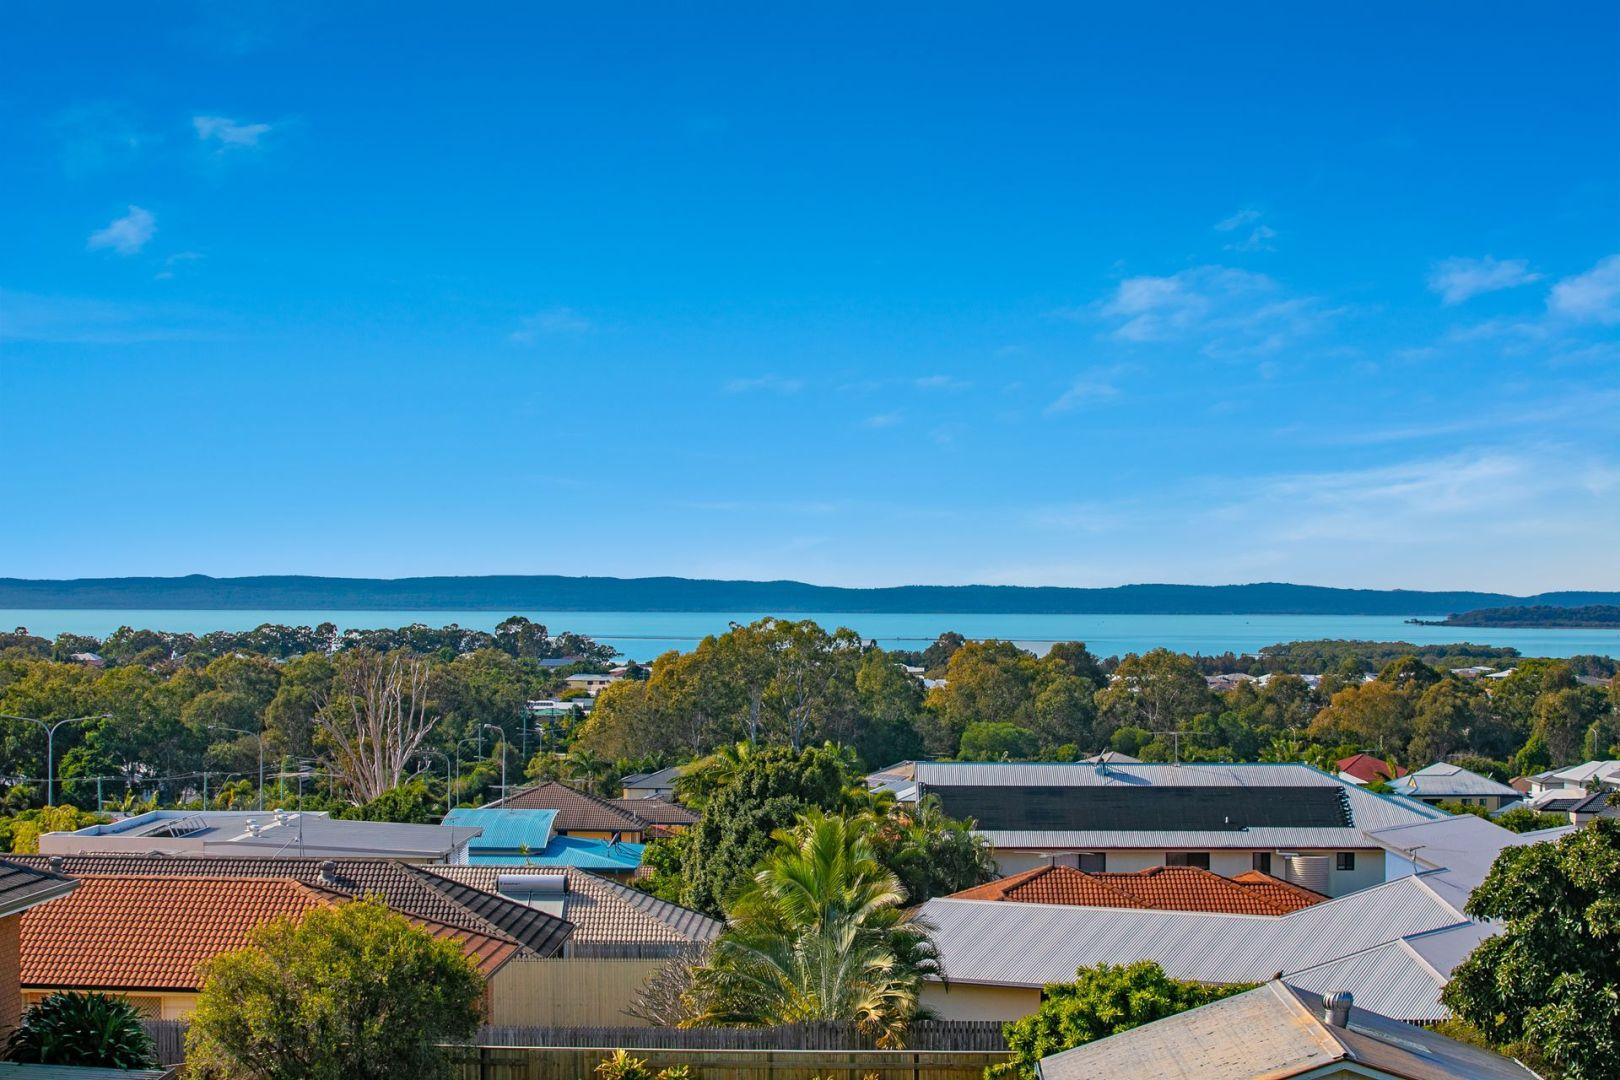 Views to Moreton Bay